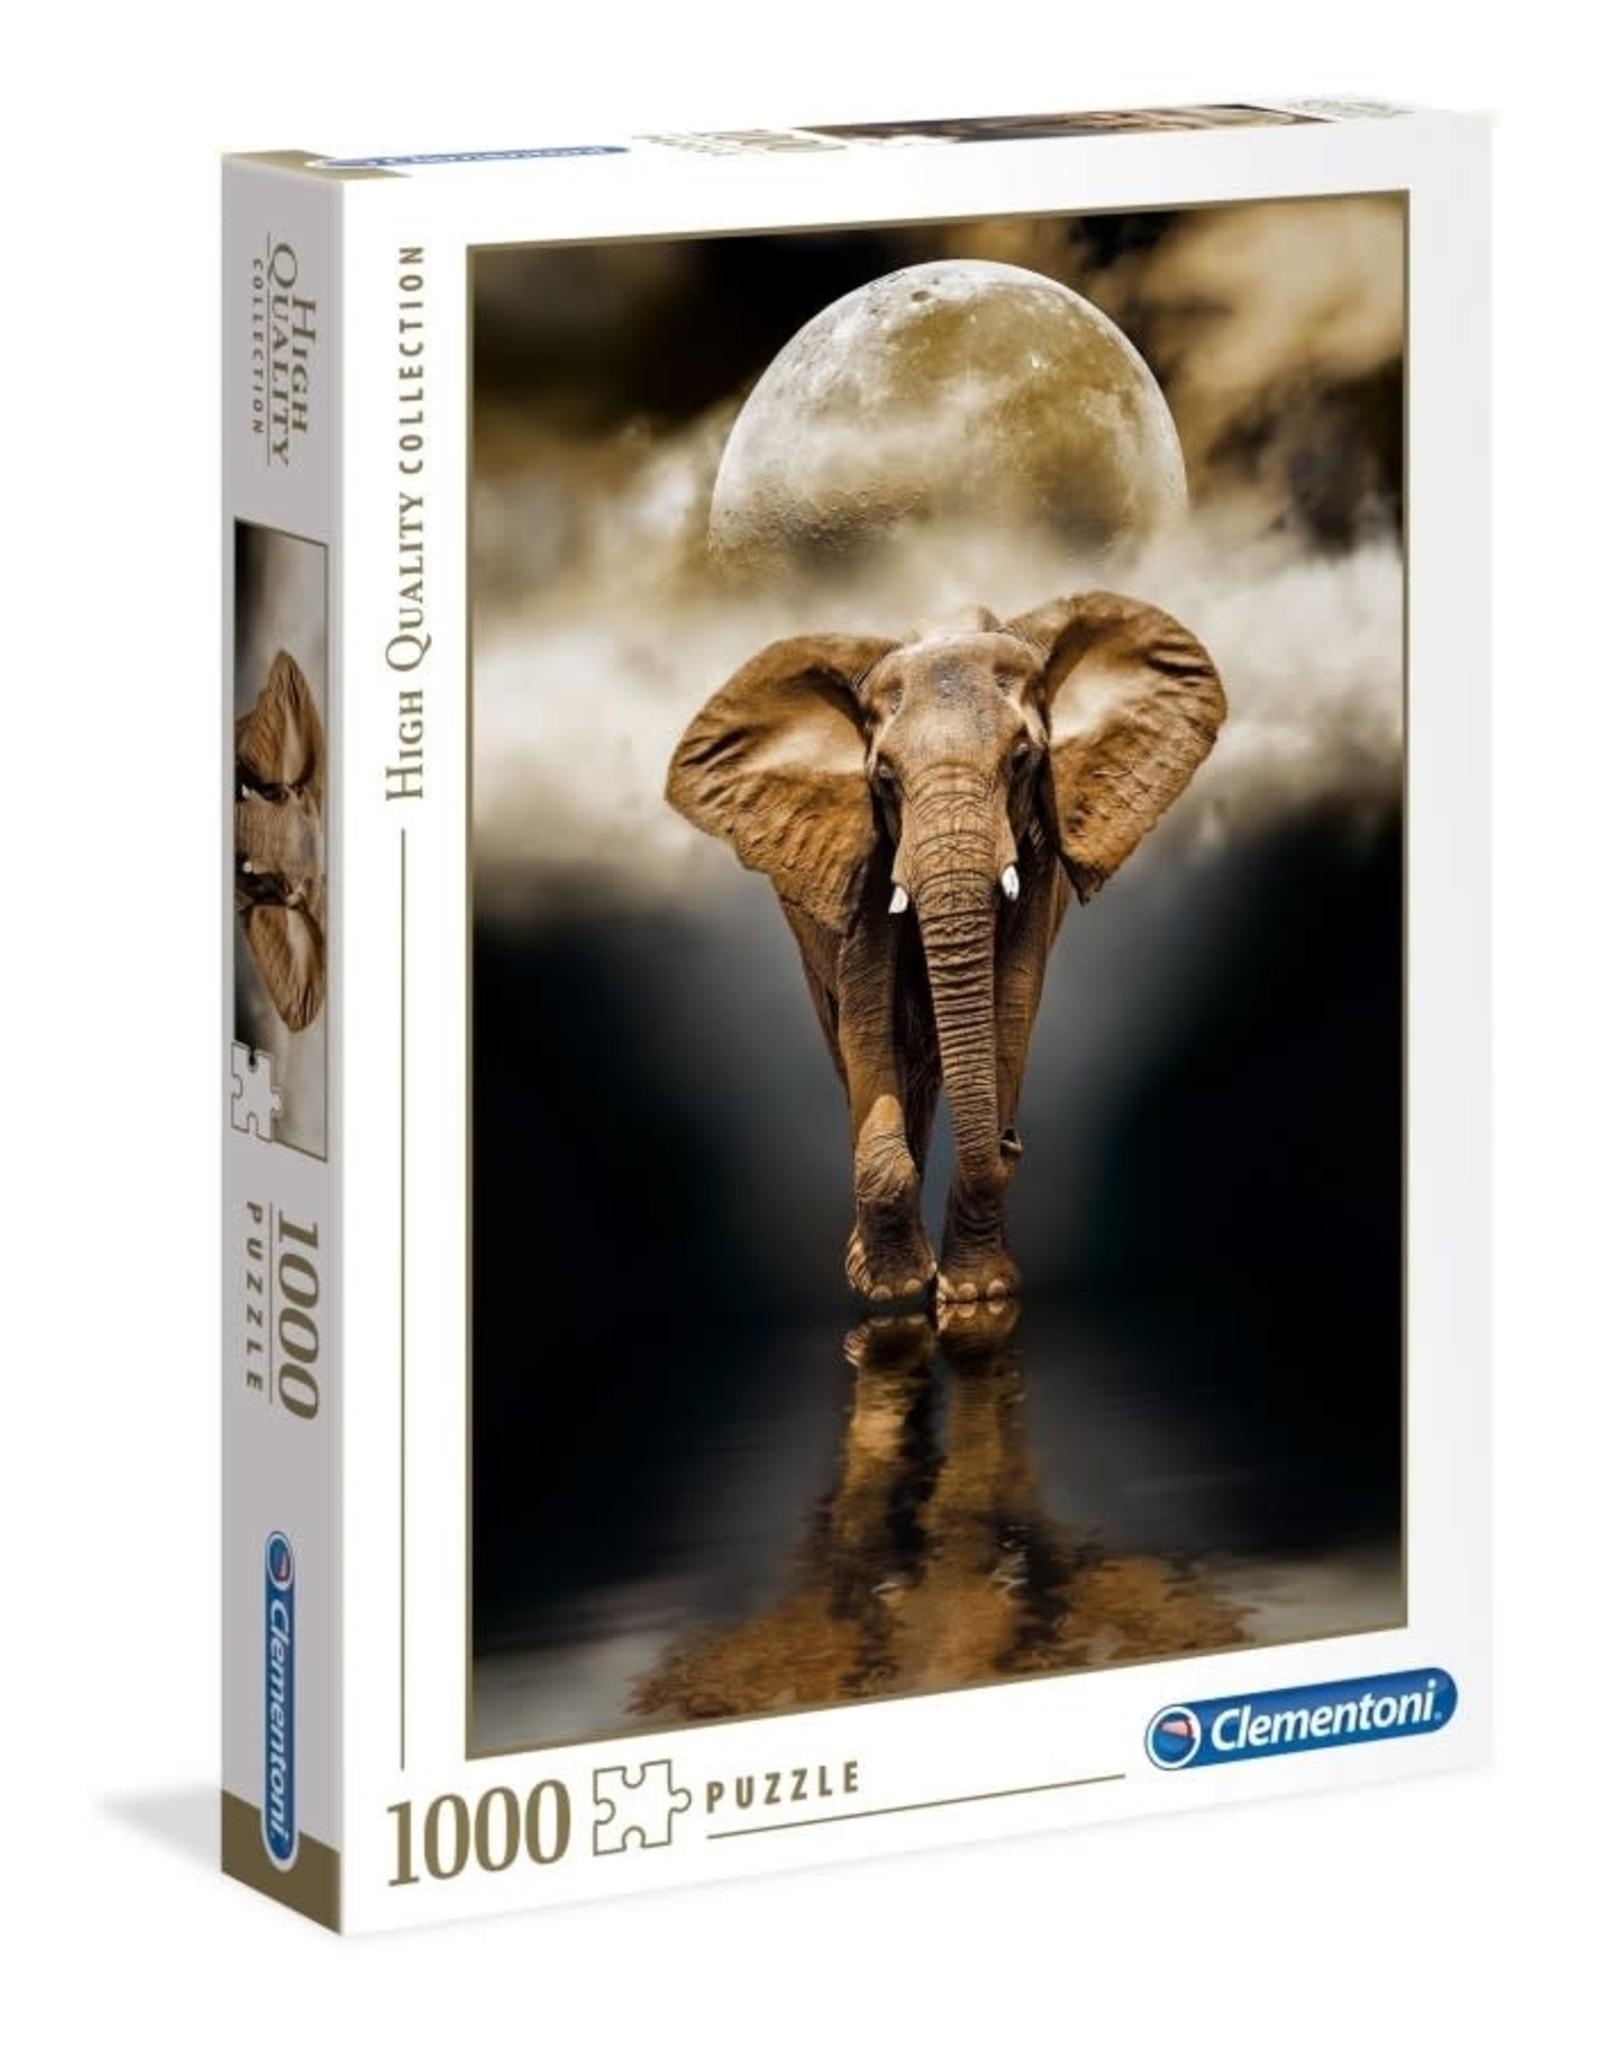 Clementoni 1000PC HQC - THE ELEPHANT